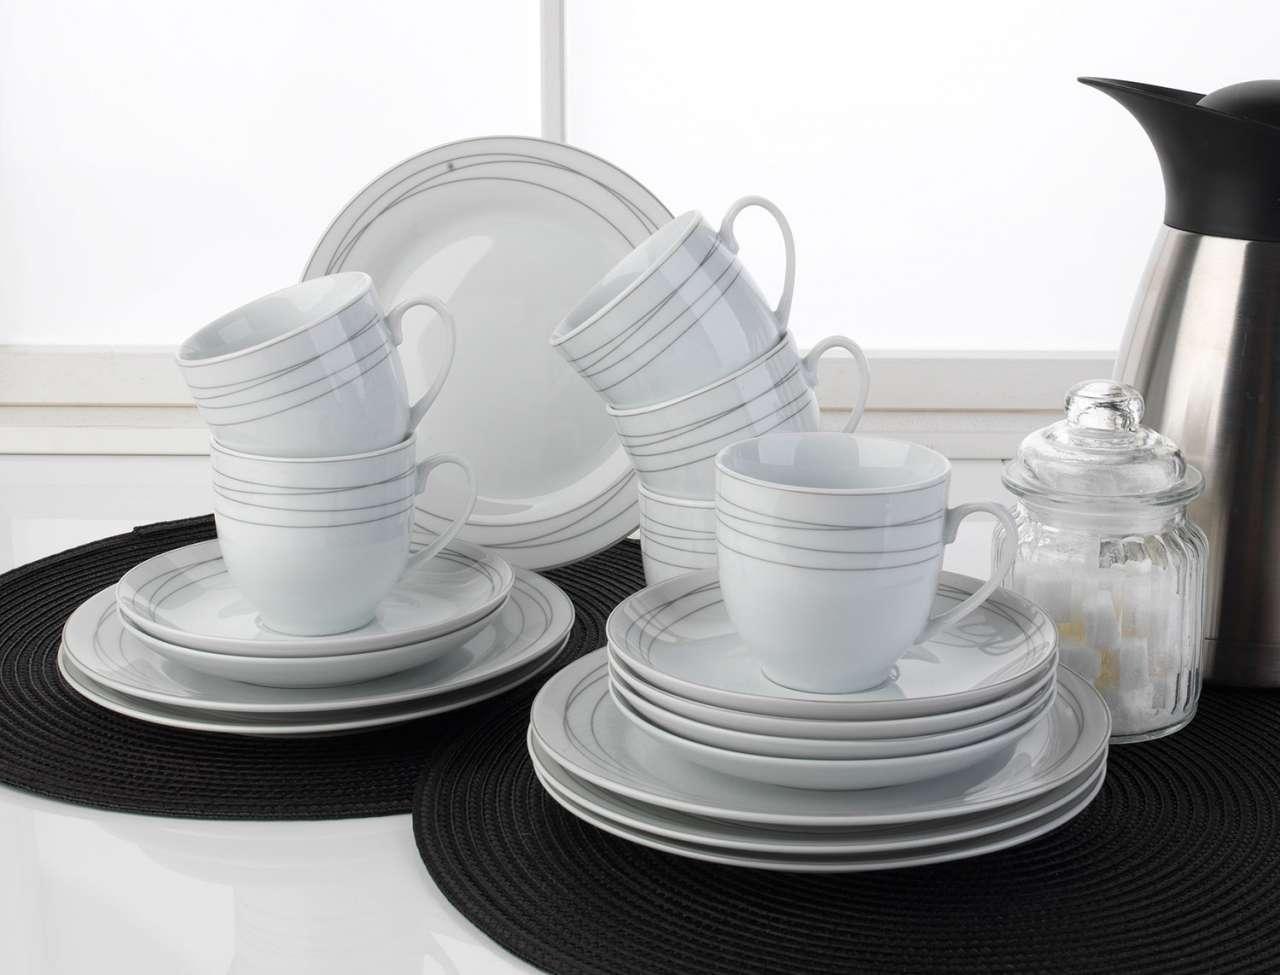 moebel-jack.de Kaffeeservice 18 tlg. PANELLA, Porzellan Weiß, rund, spülmaschinengeeignet